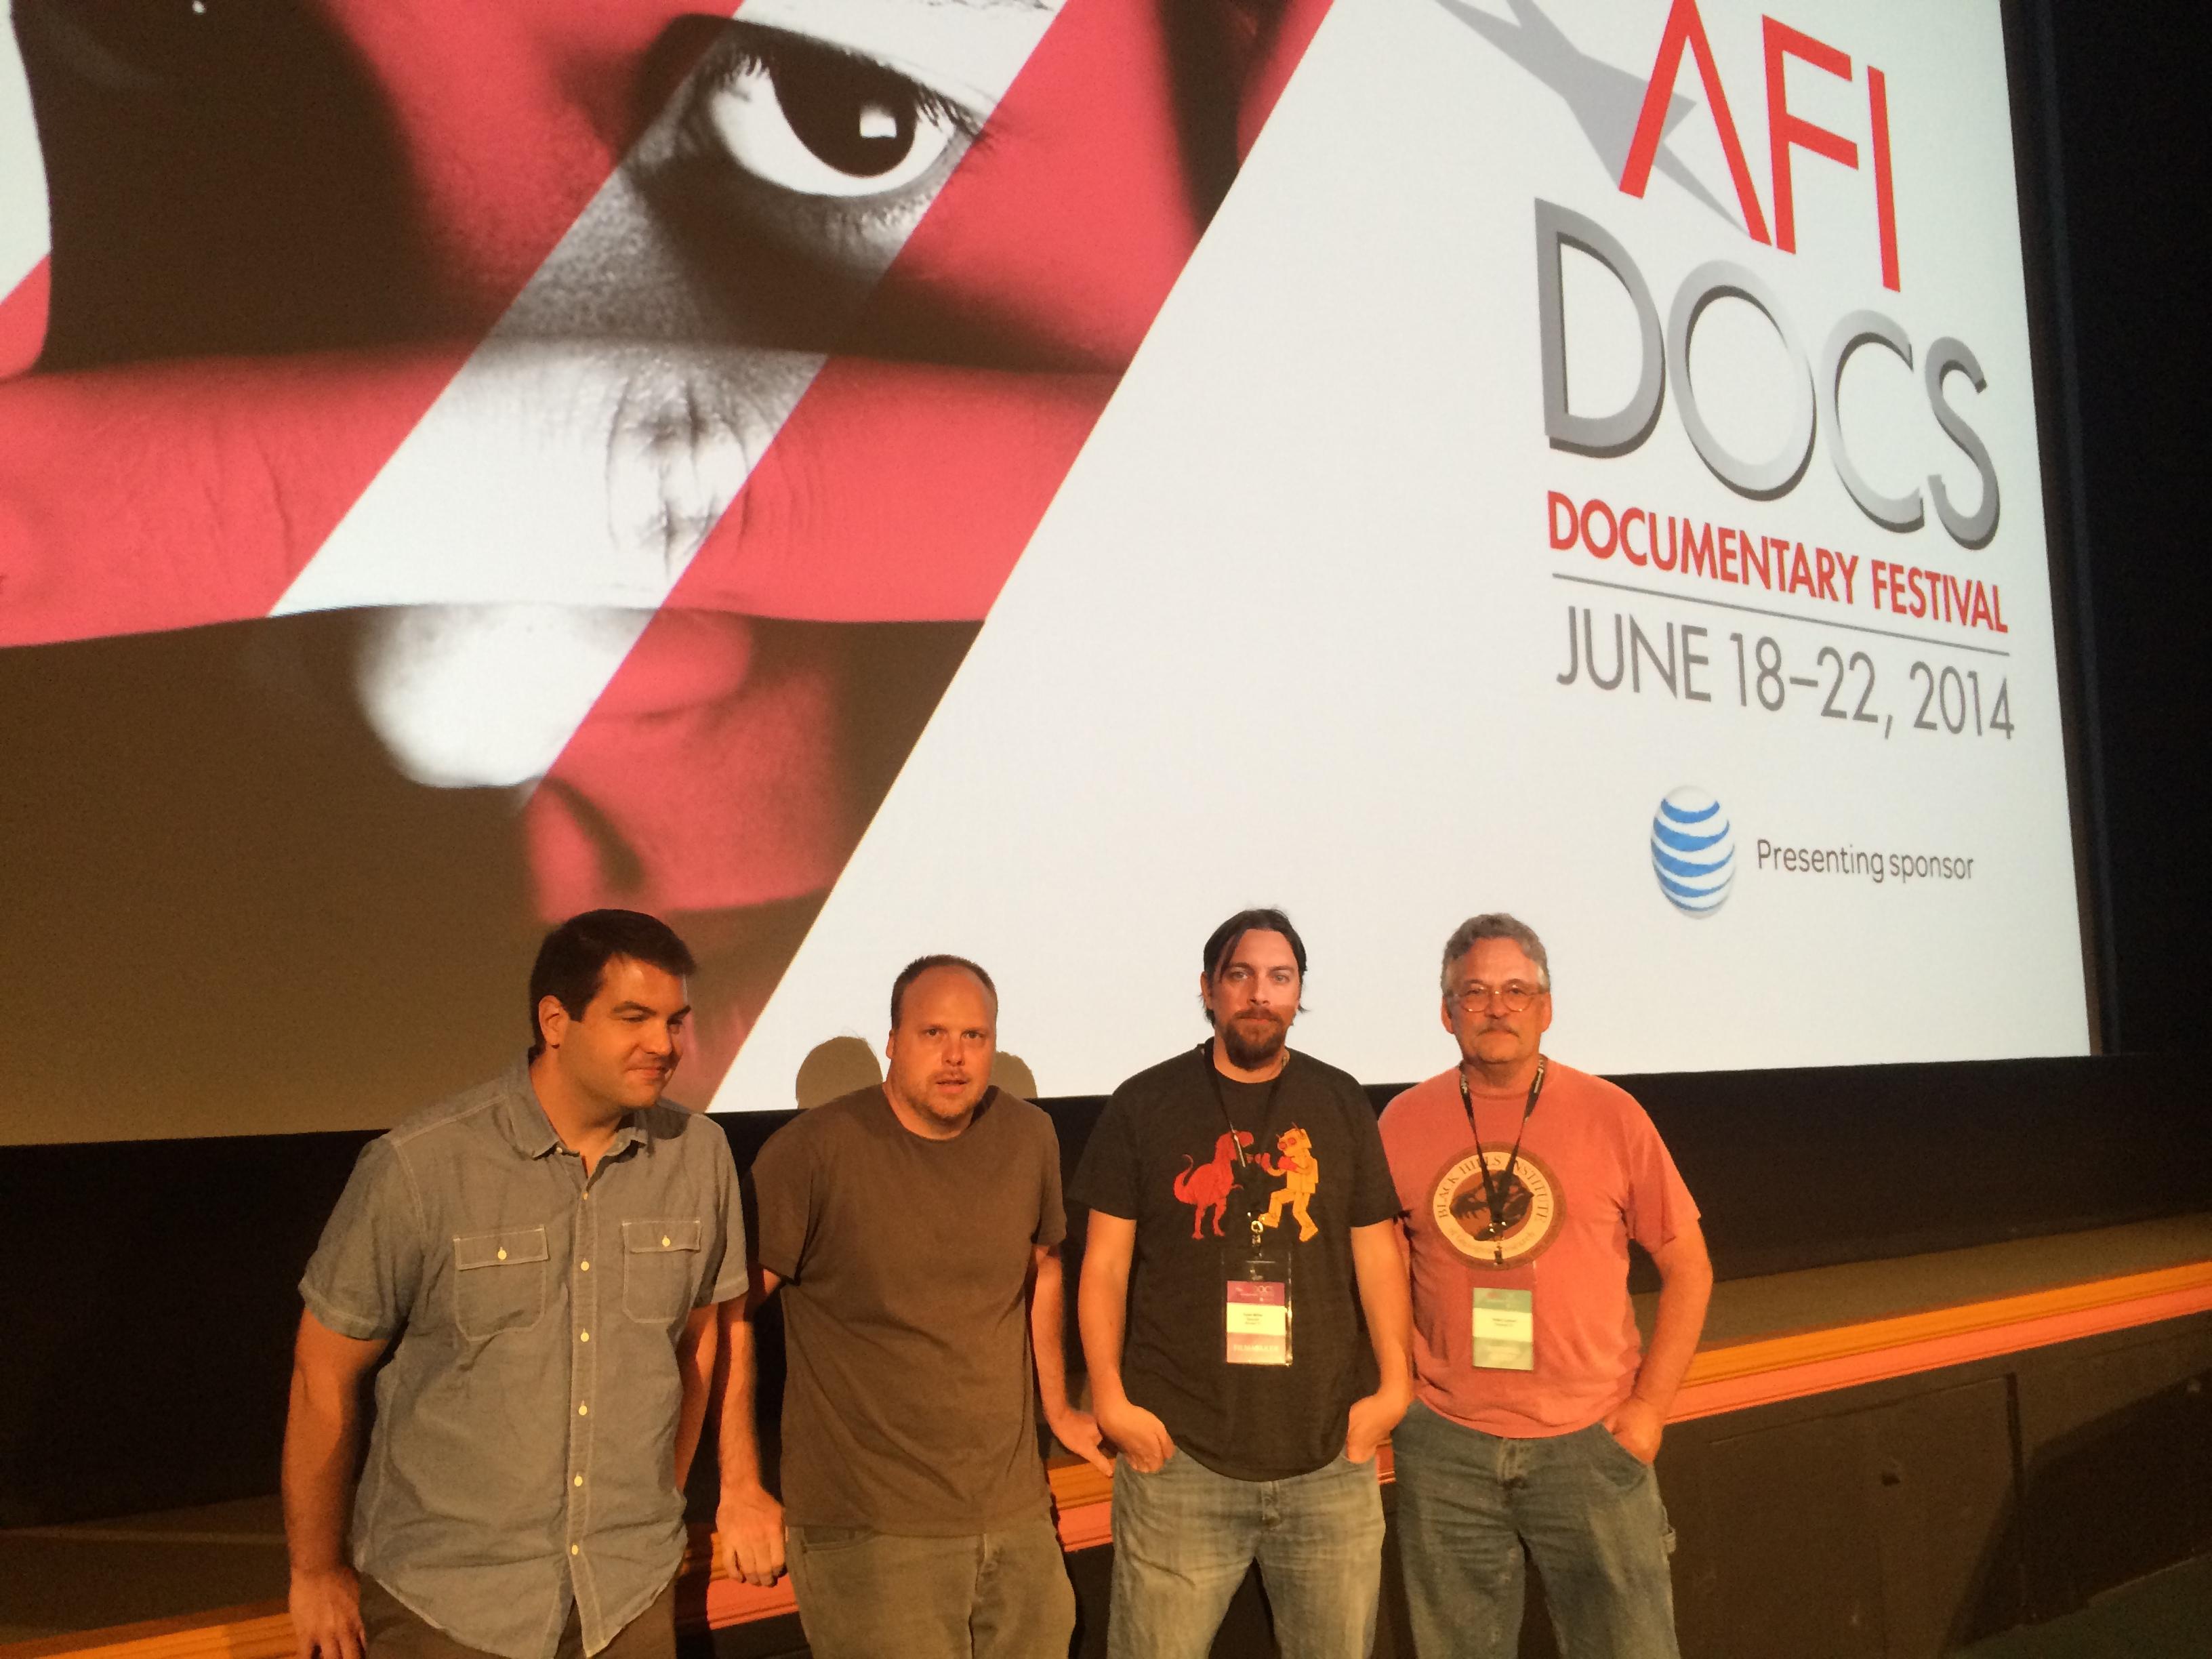 Q&A - Silver Theater / AFIDocs.